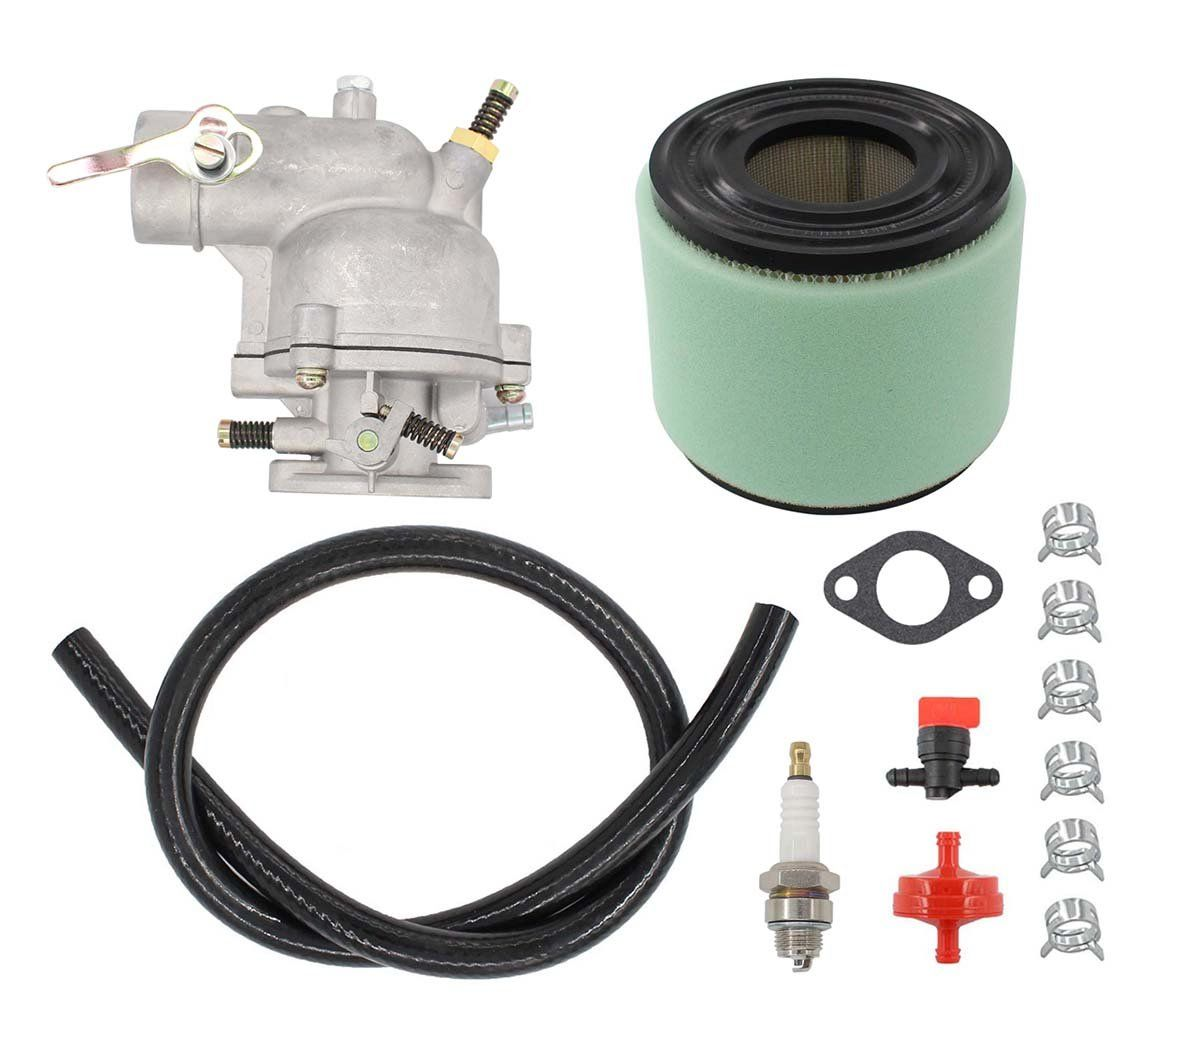 small resolution of carburetor air filter fuel hose shut off valve for briggs and stratton 390323 394228 299169 7